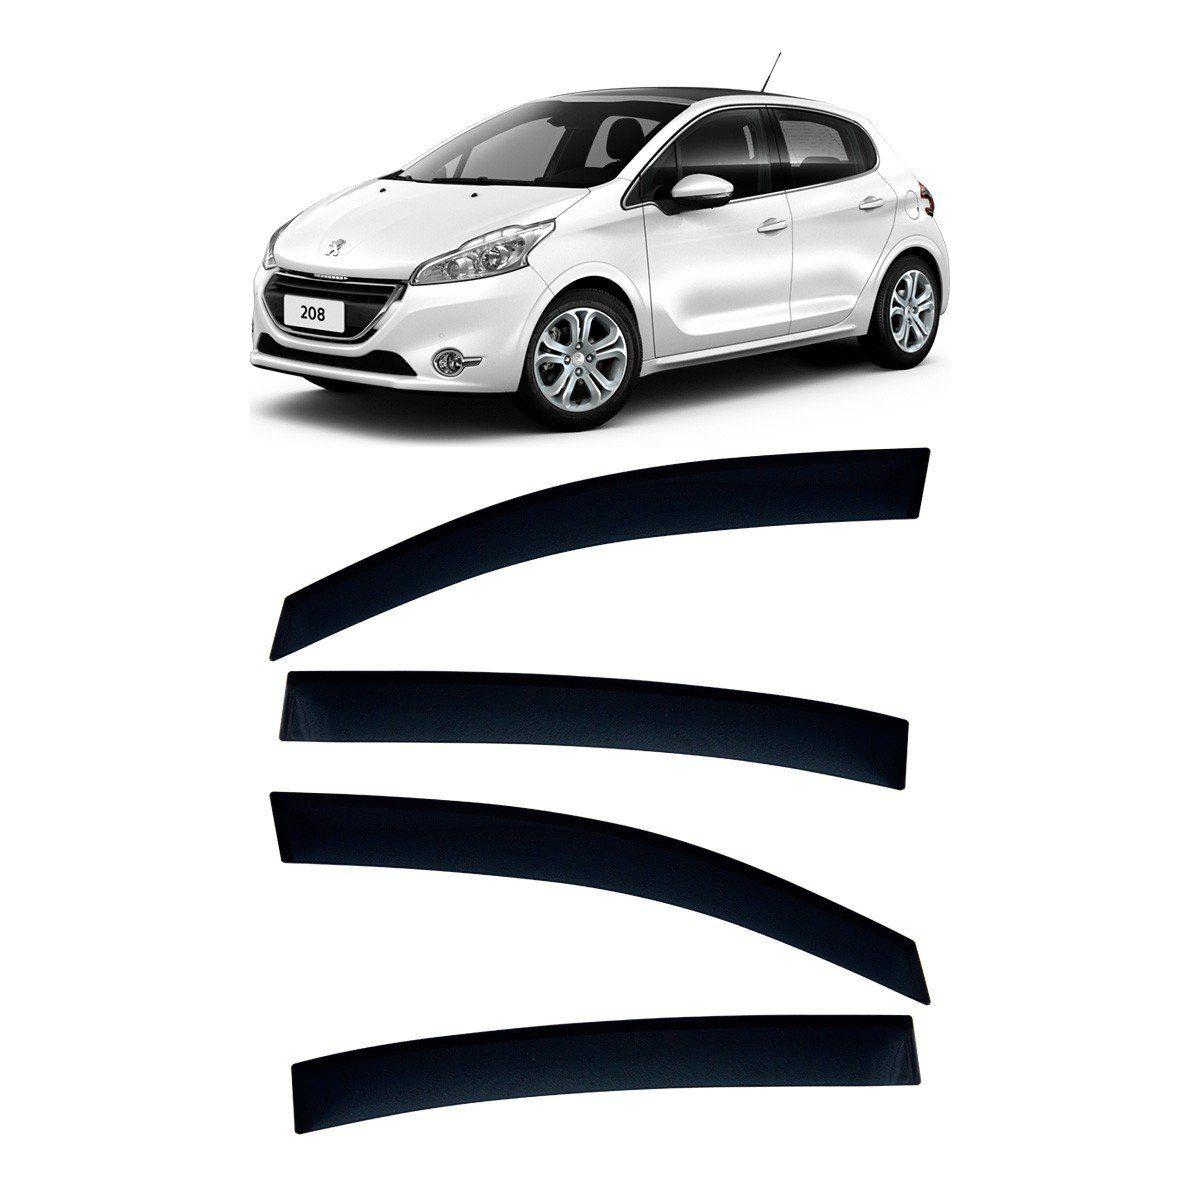 Calha De Chuva Peugeot 208 Defletor TG Poli